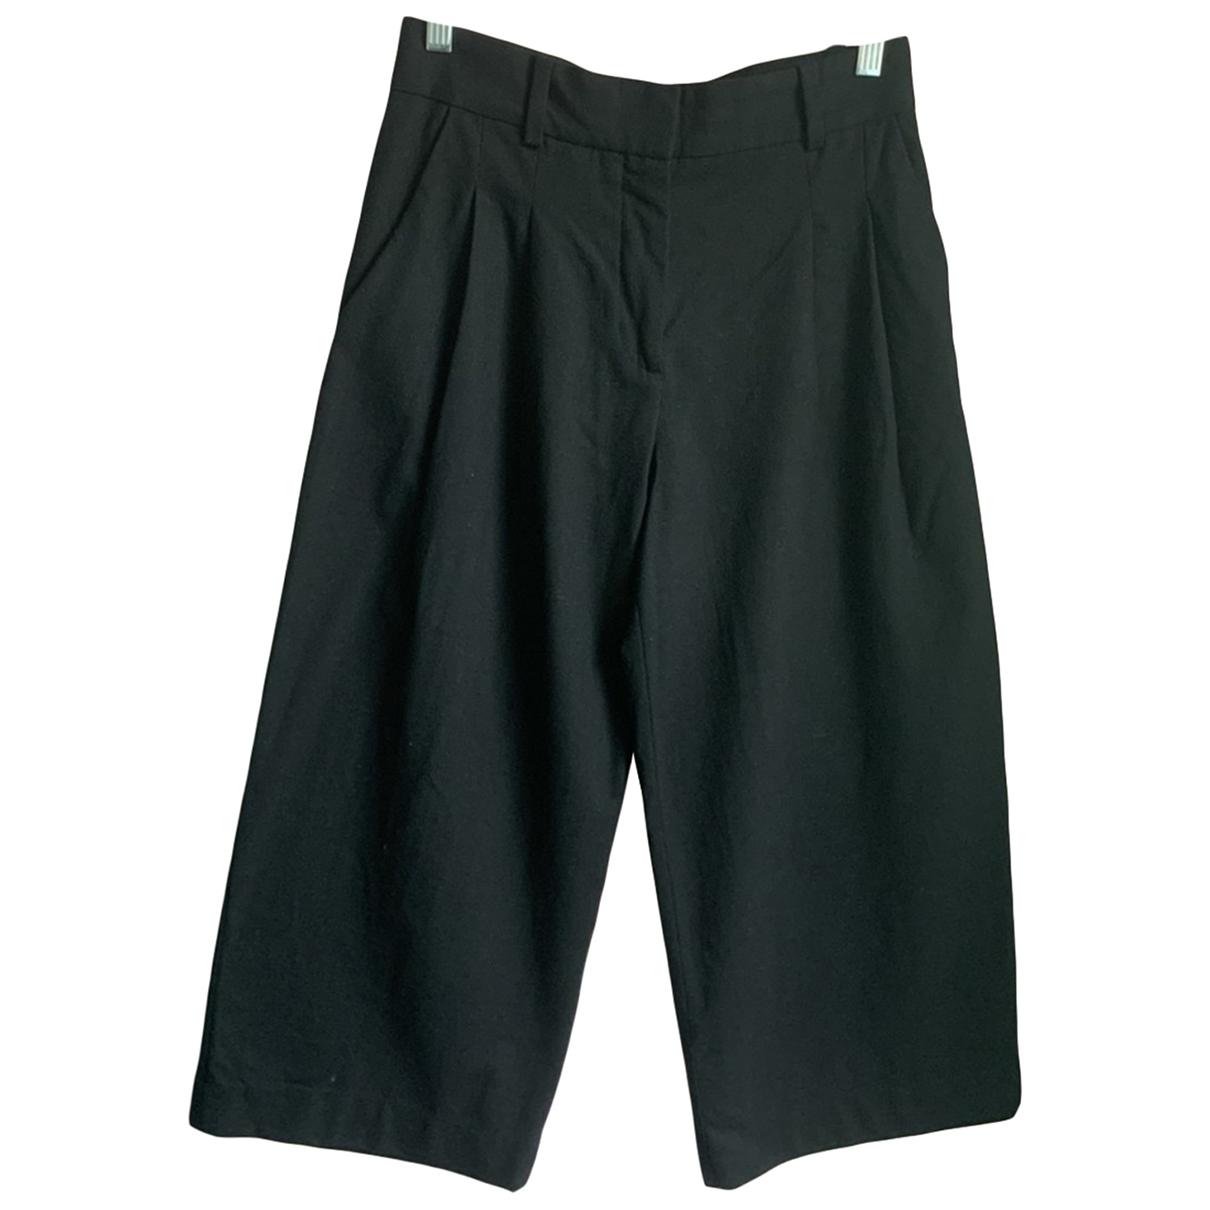 Cos \N Black Wool Trousers for Women 34 FR